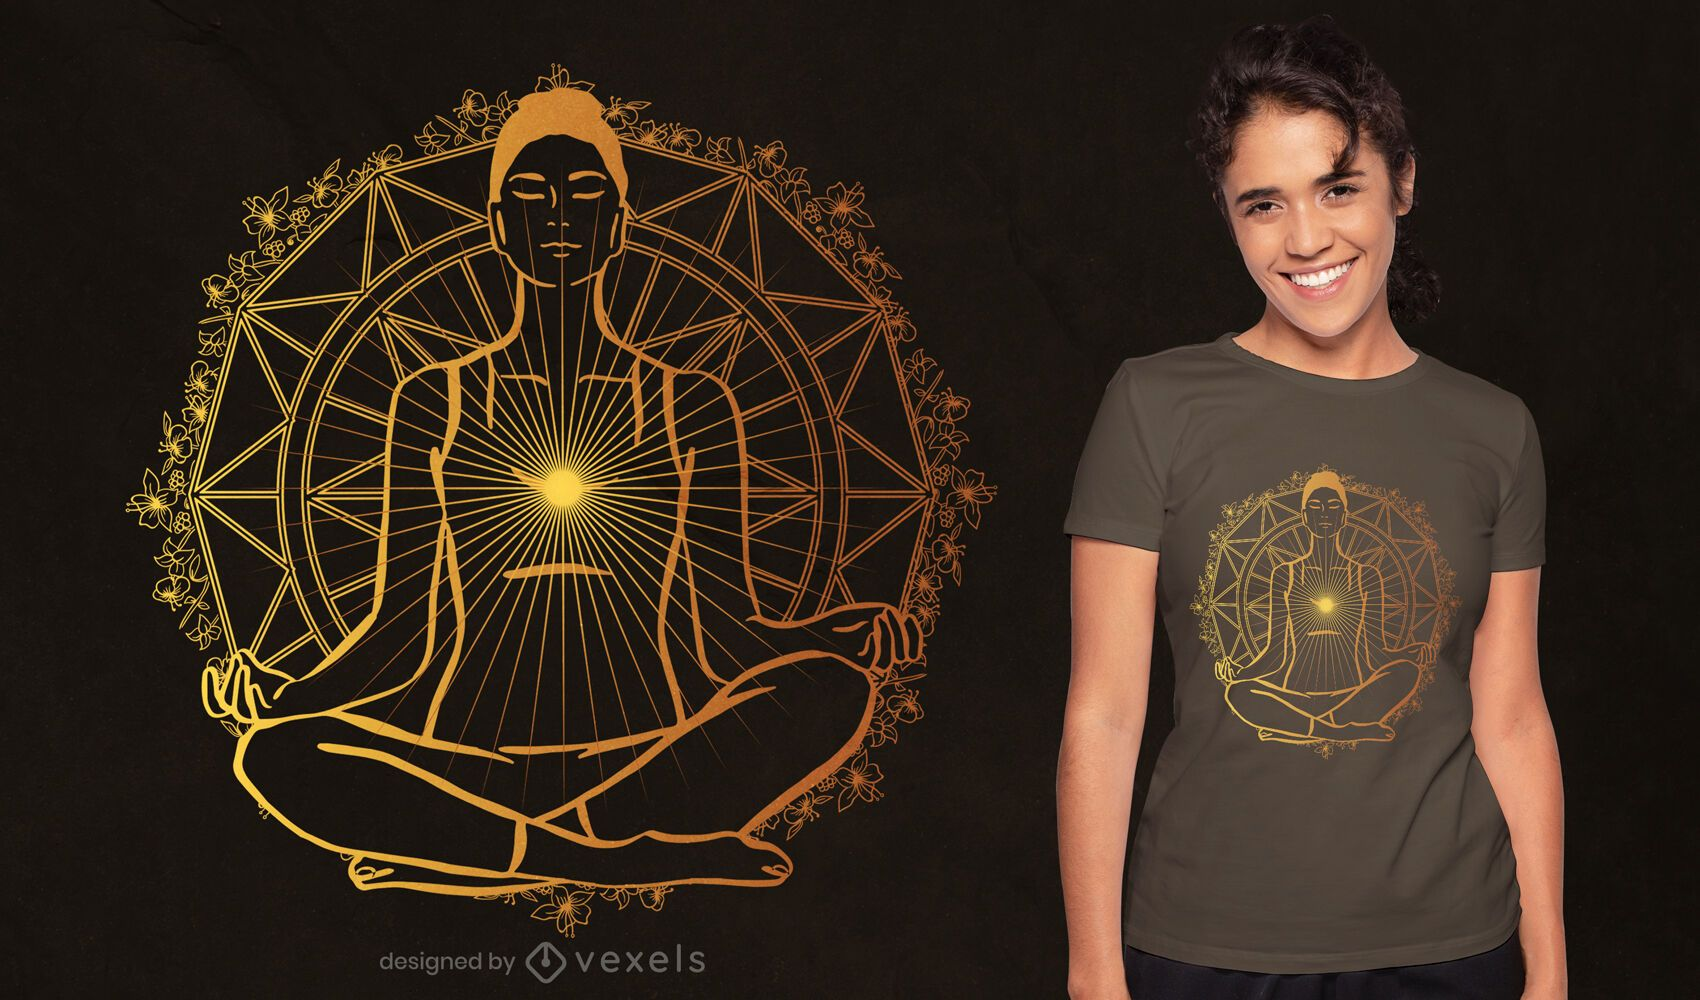 Enlightened spiritual t-shirt design